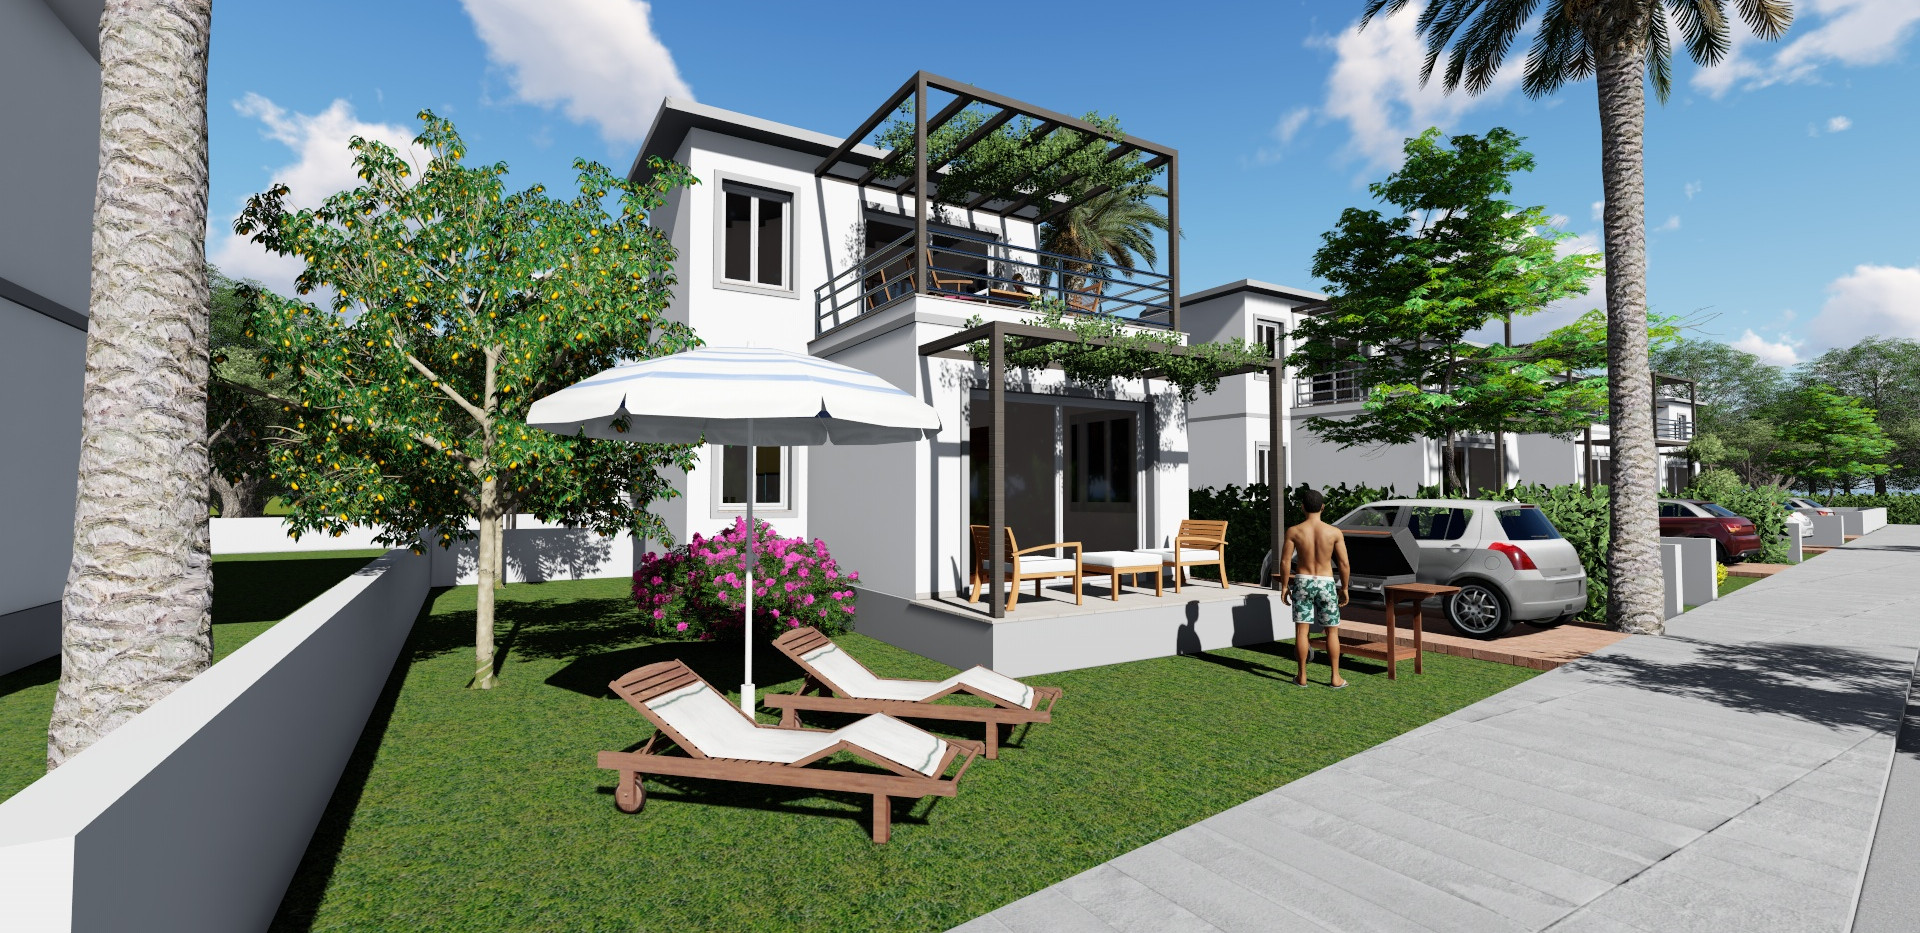 A type Villa Picture 1 - Kopya.jpg